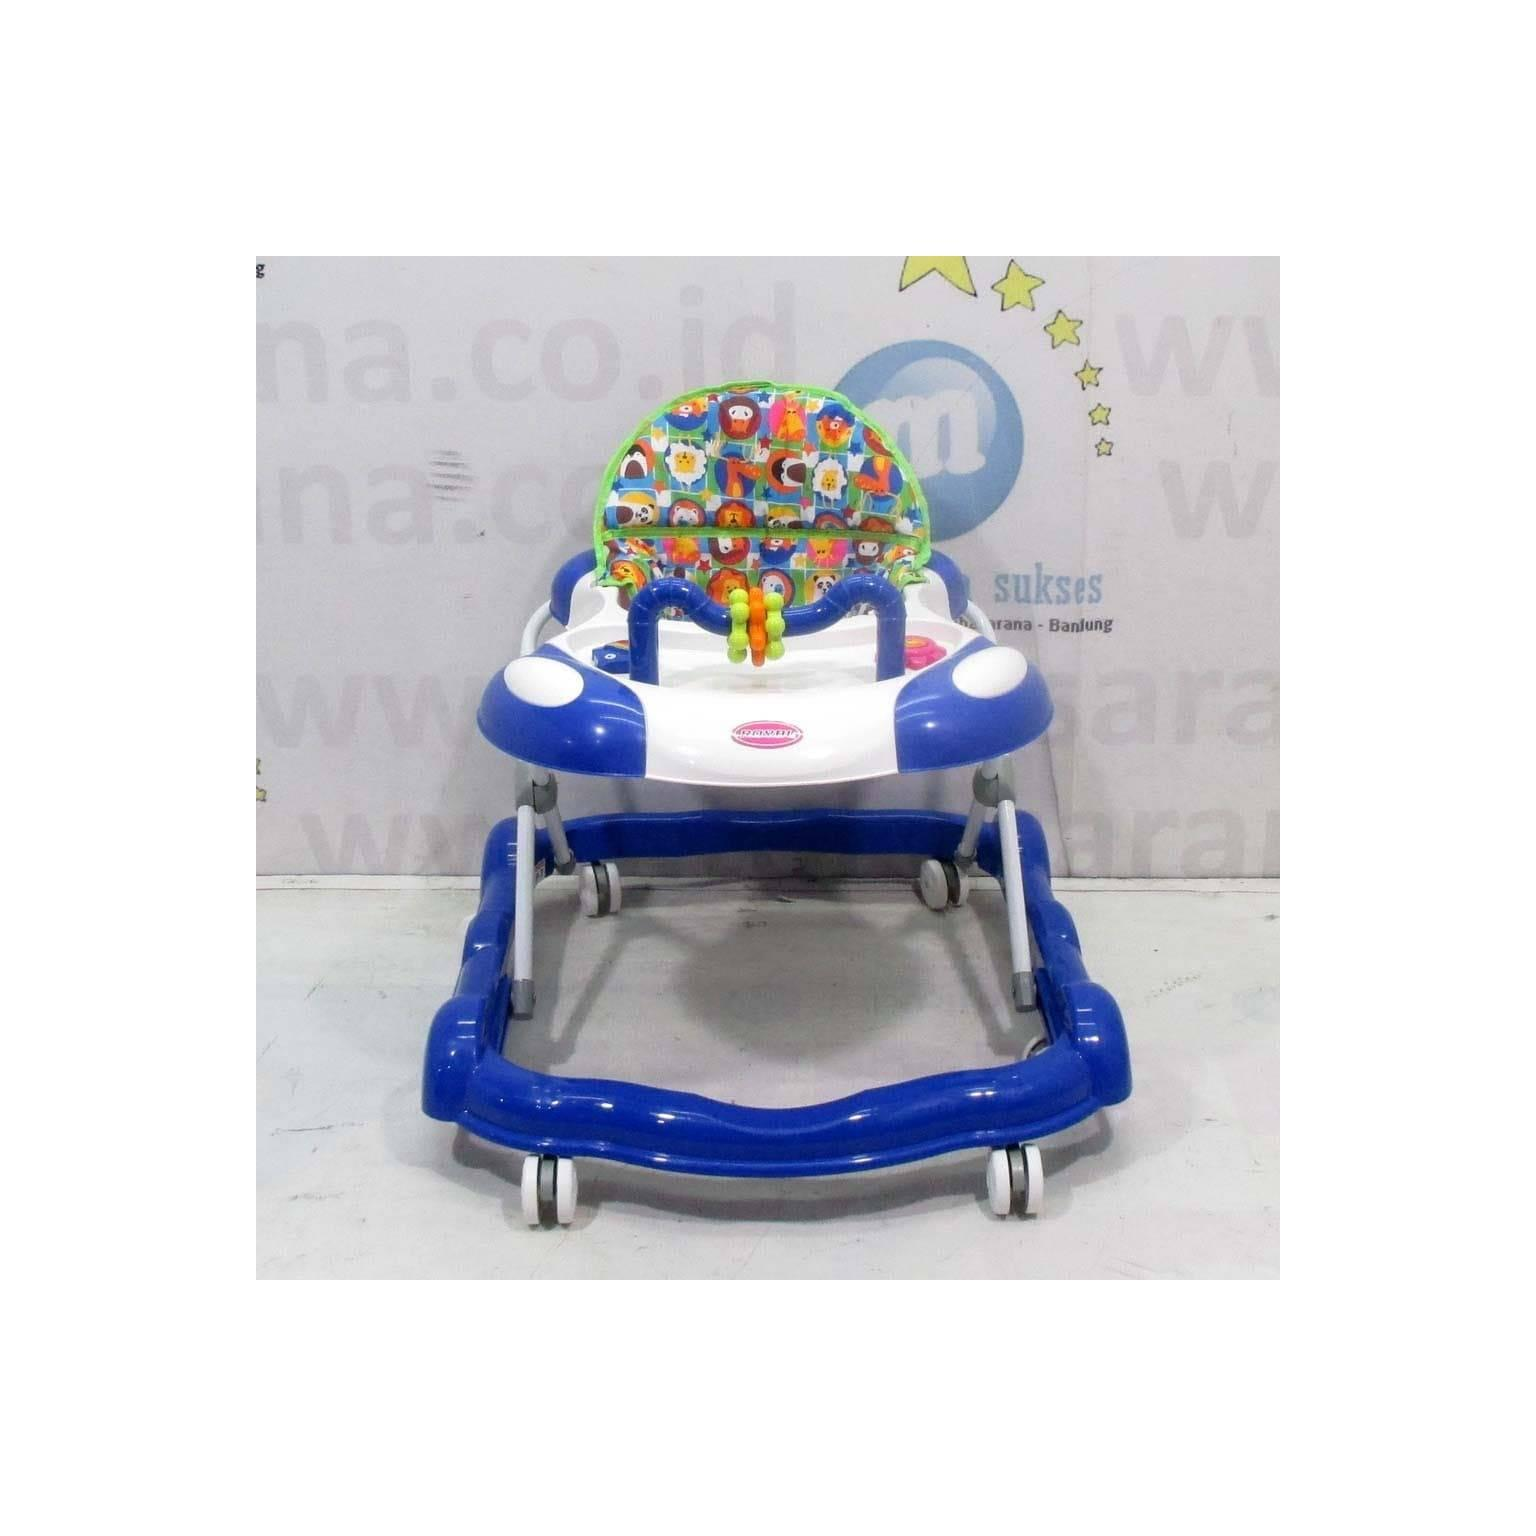 Grosir 2 in 1 Royal RY828 Musik Roller Toy Baby Walker & Dorongan .